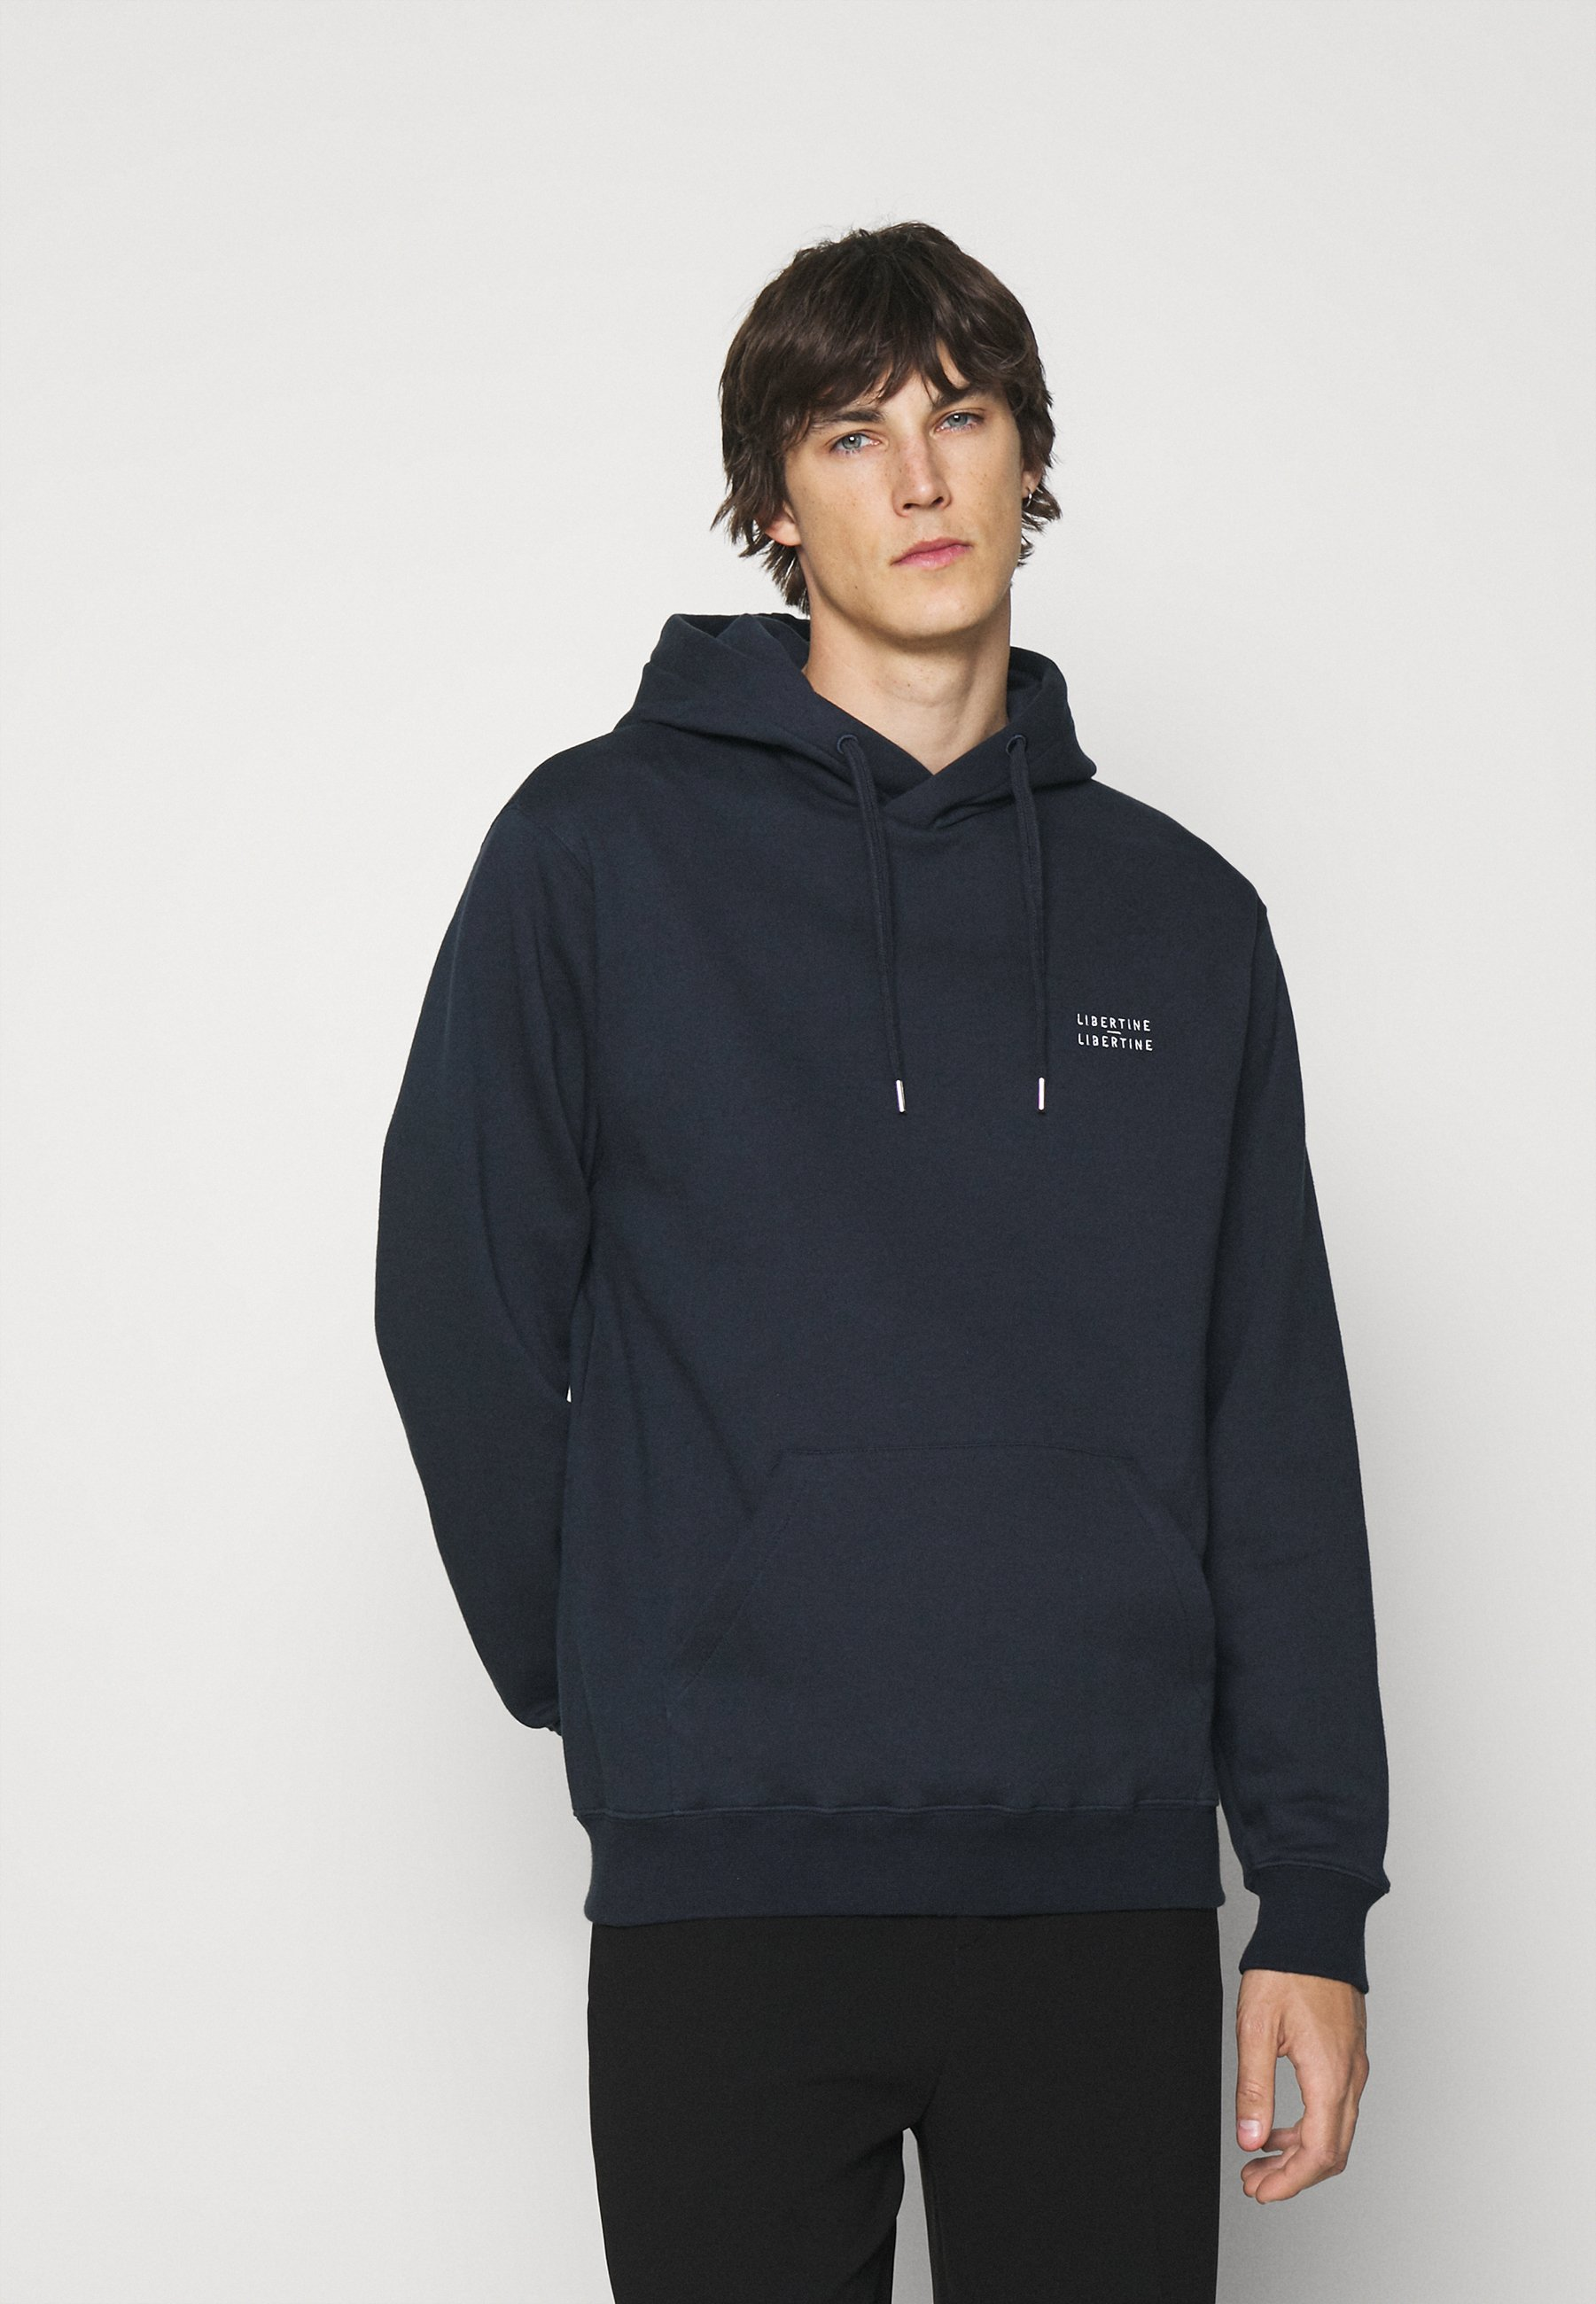 Homme COPELAND - Sweatshirt